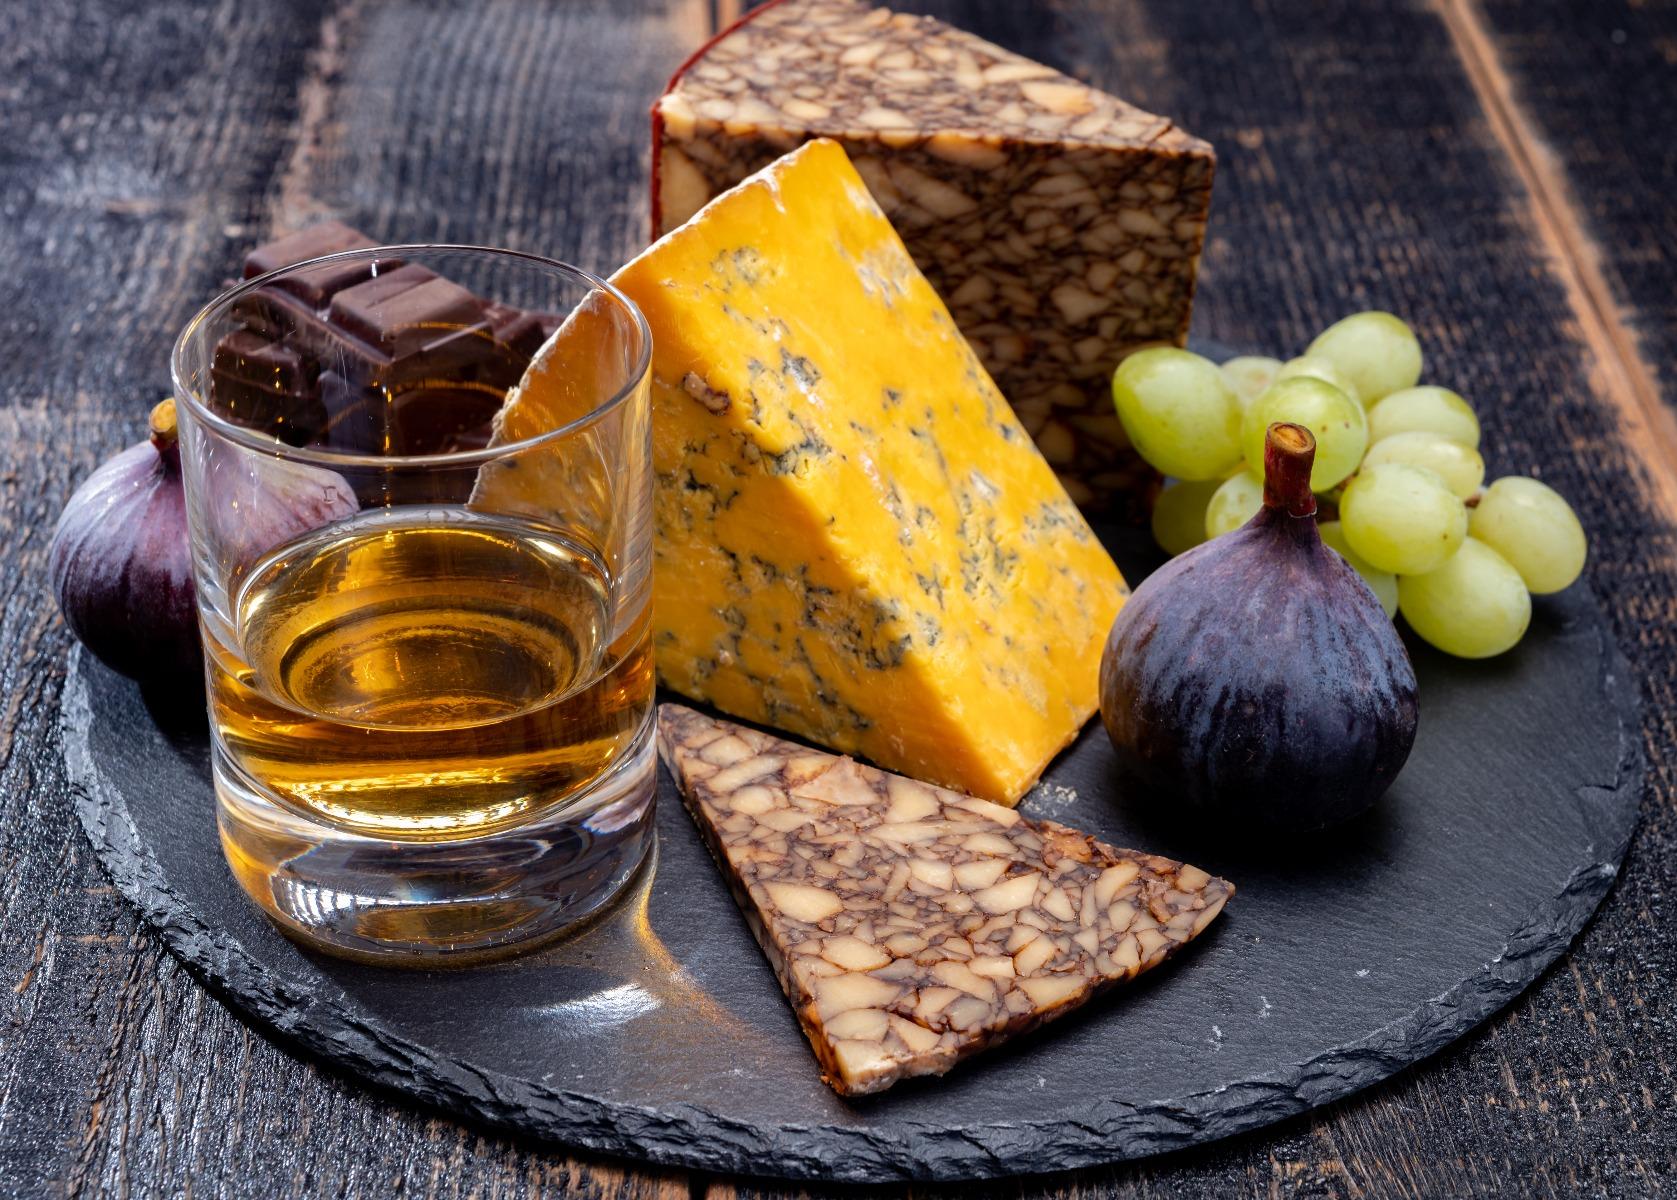 Cheese and Bourbon Pairing